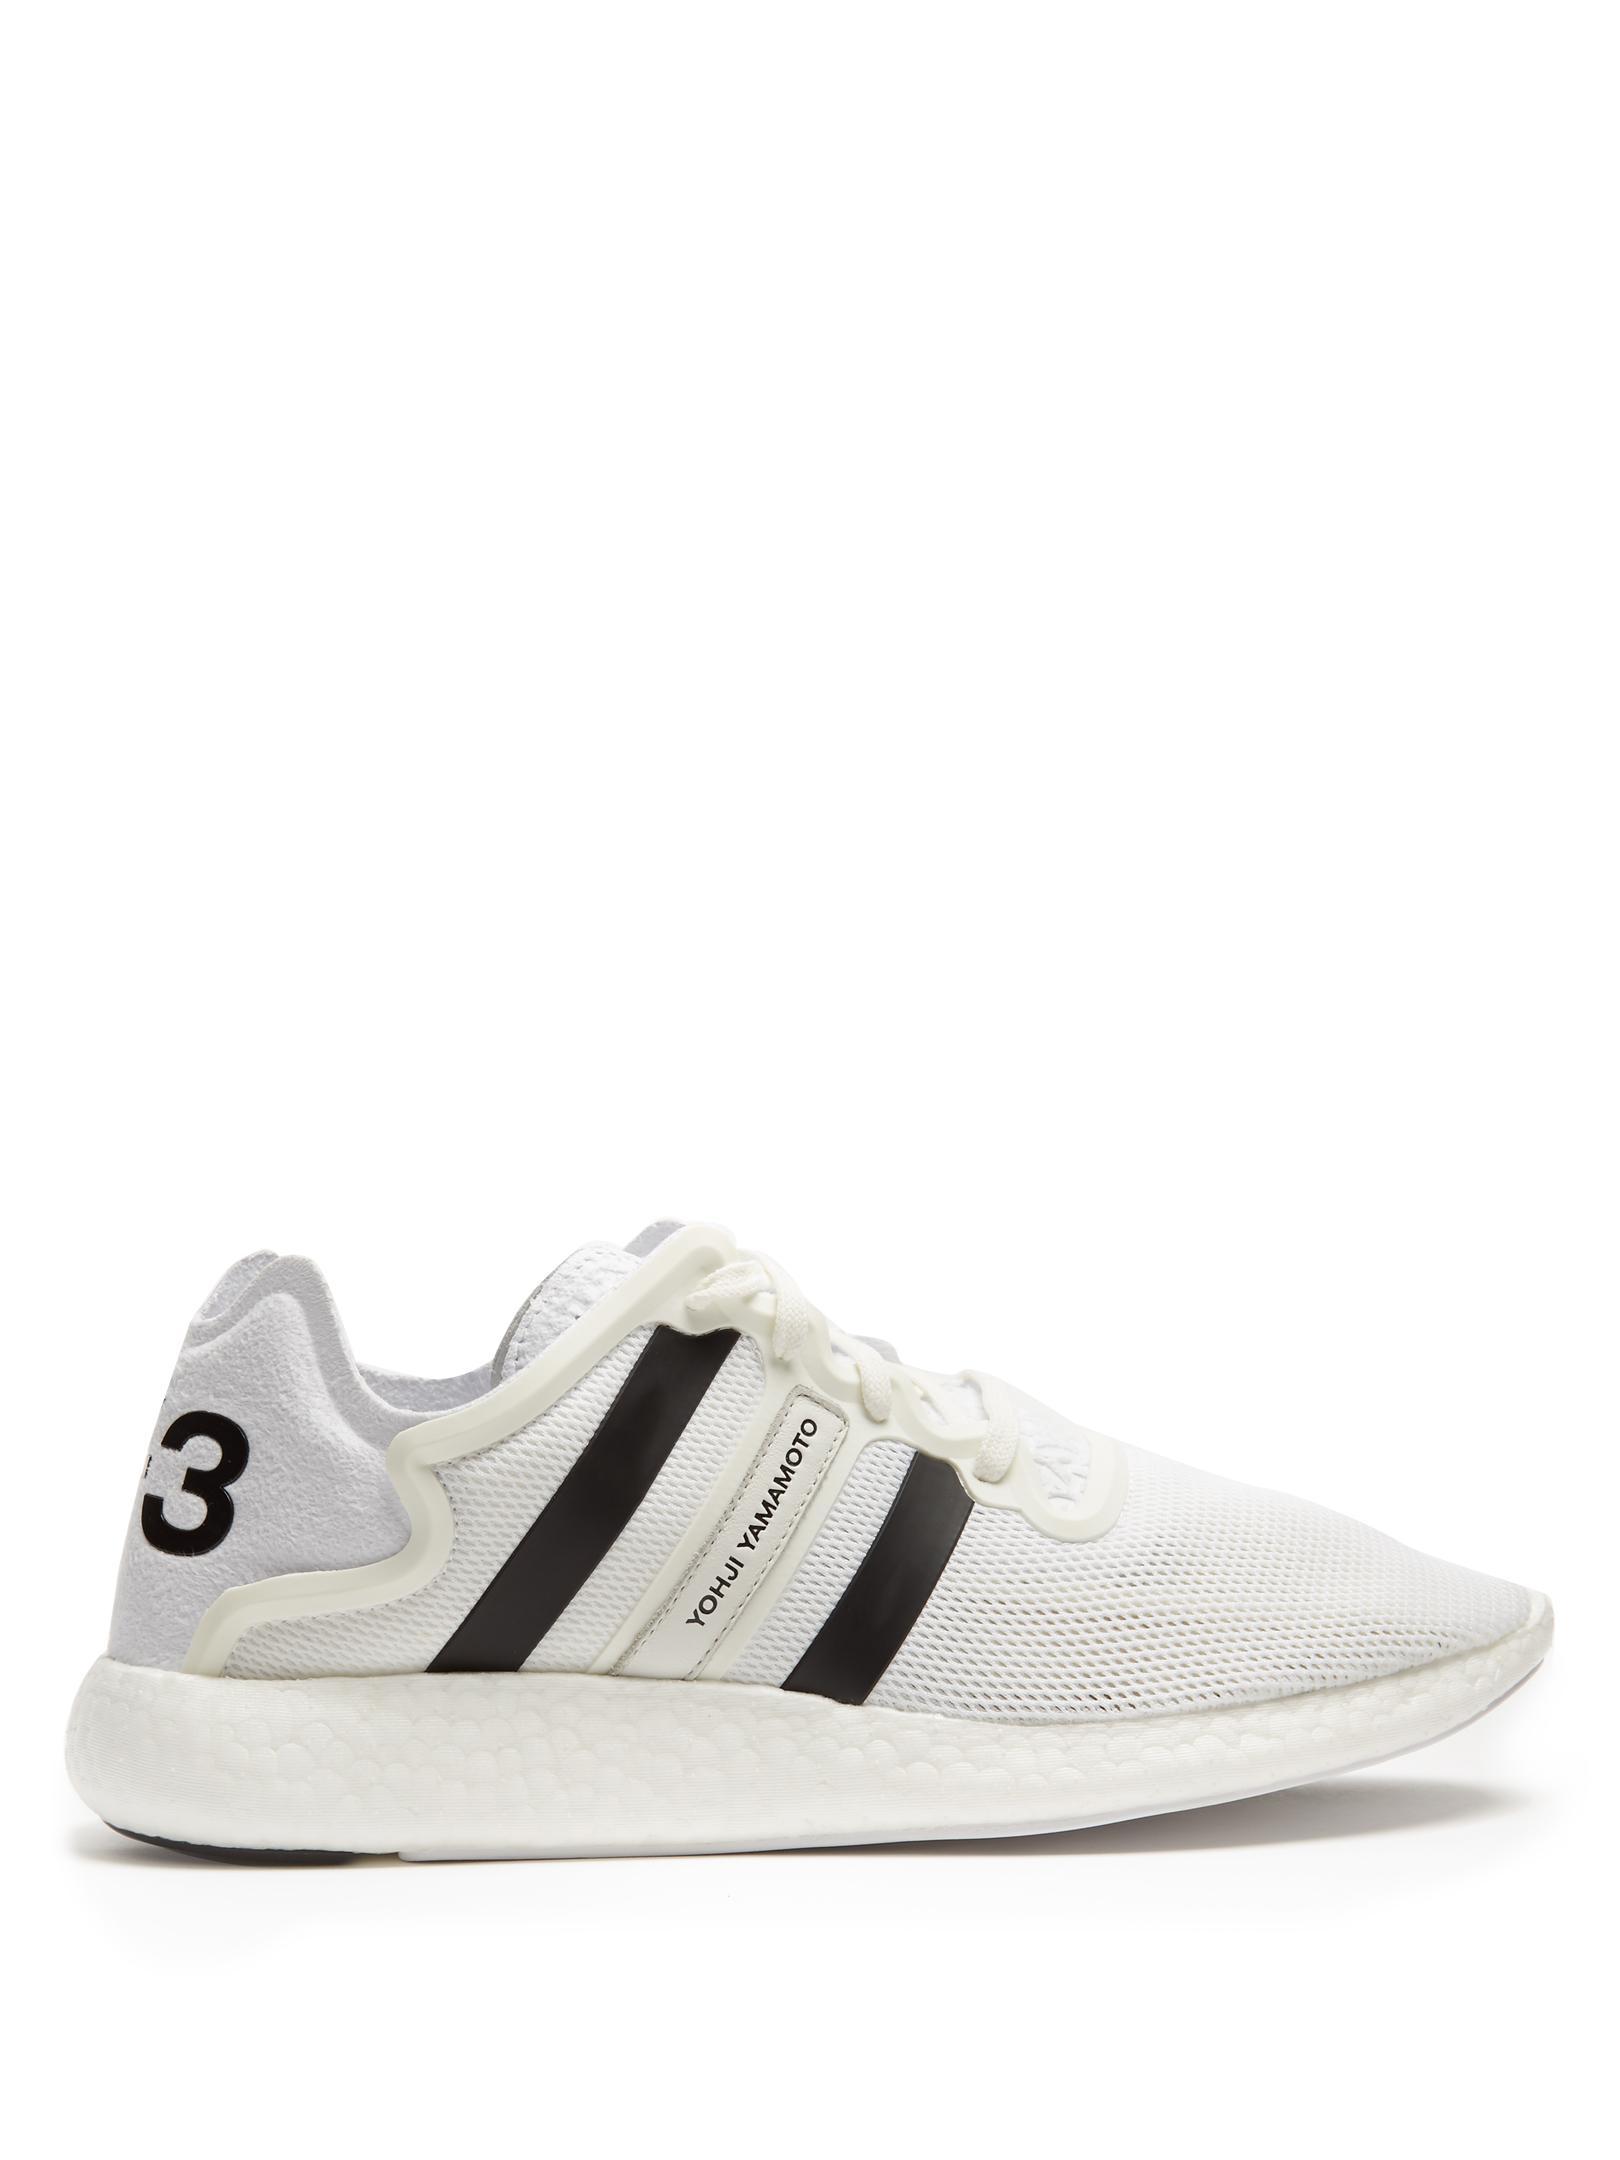 fdd5528ad Lyst - Y-3 Yohji Run Low-top Trainers in White for Men